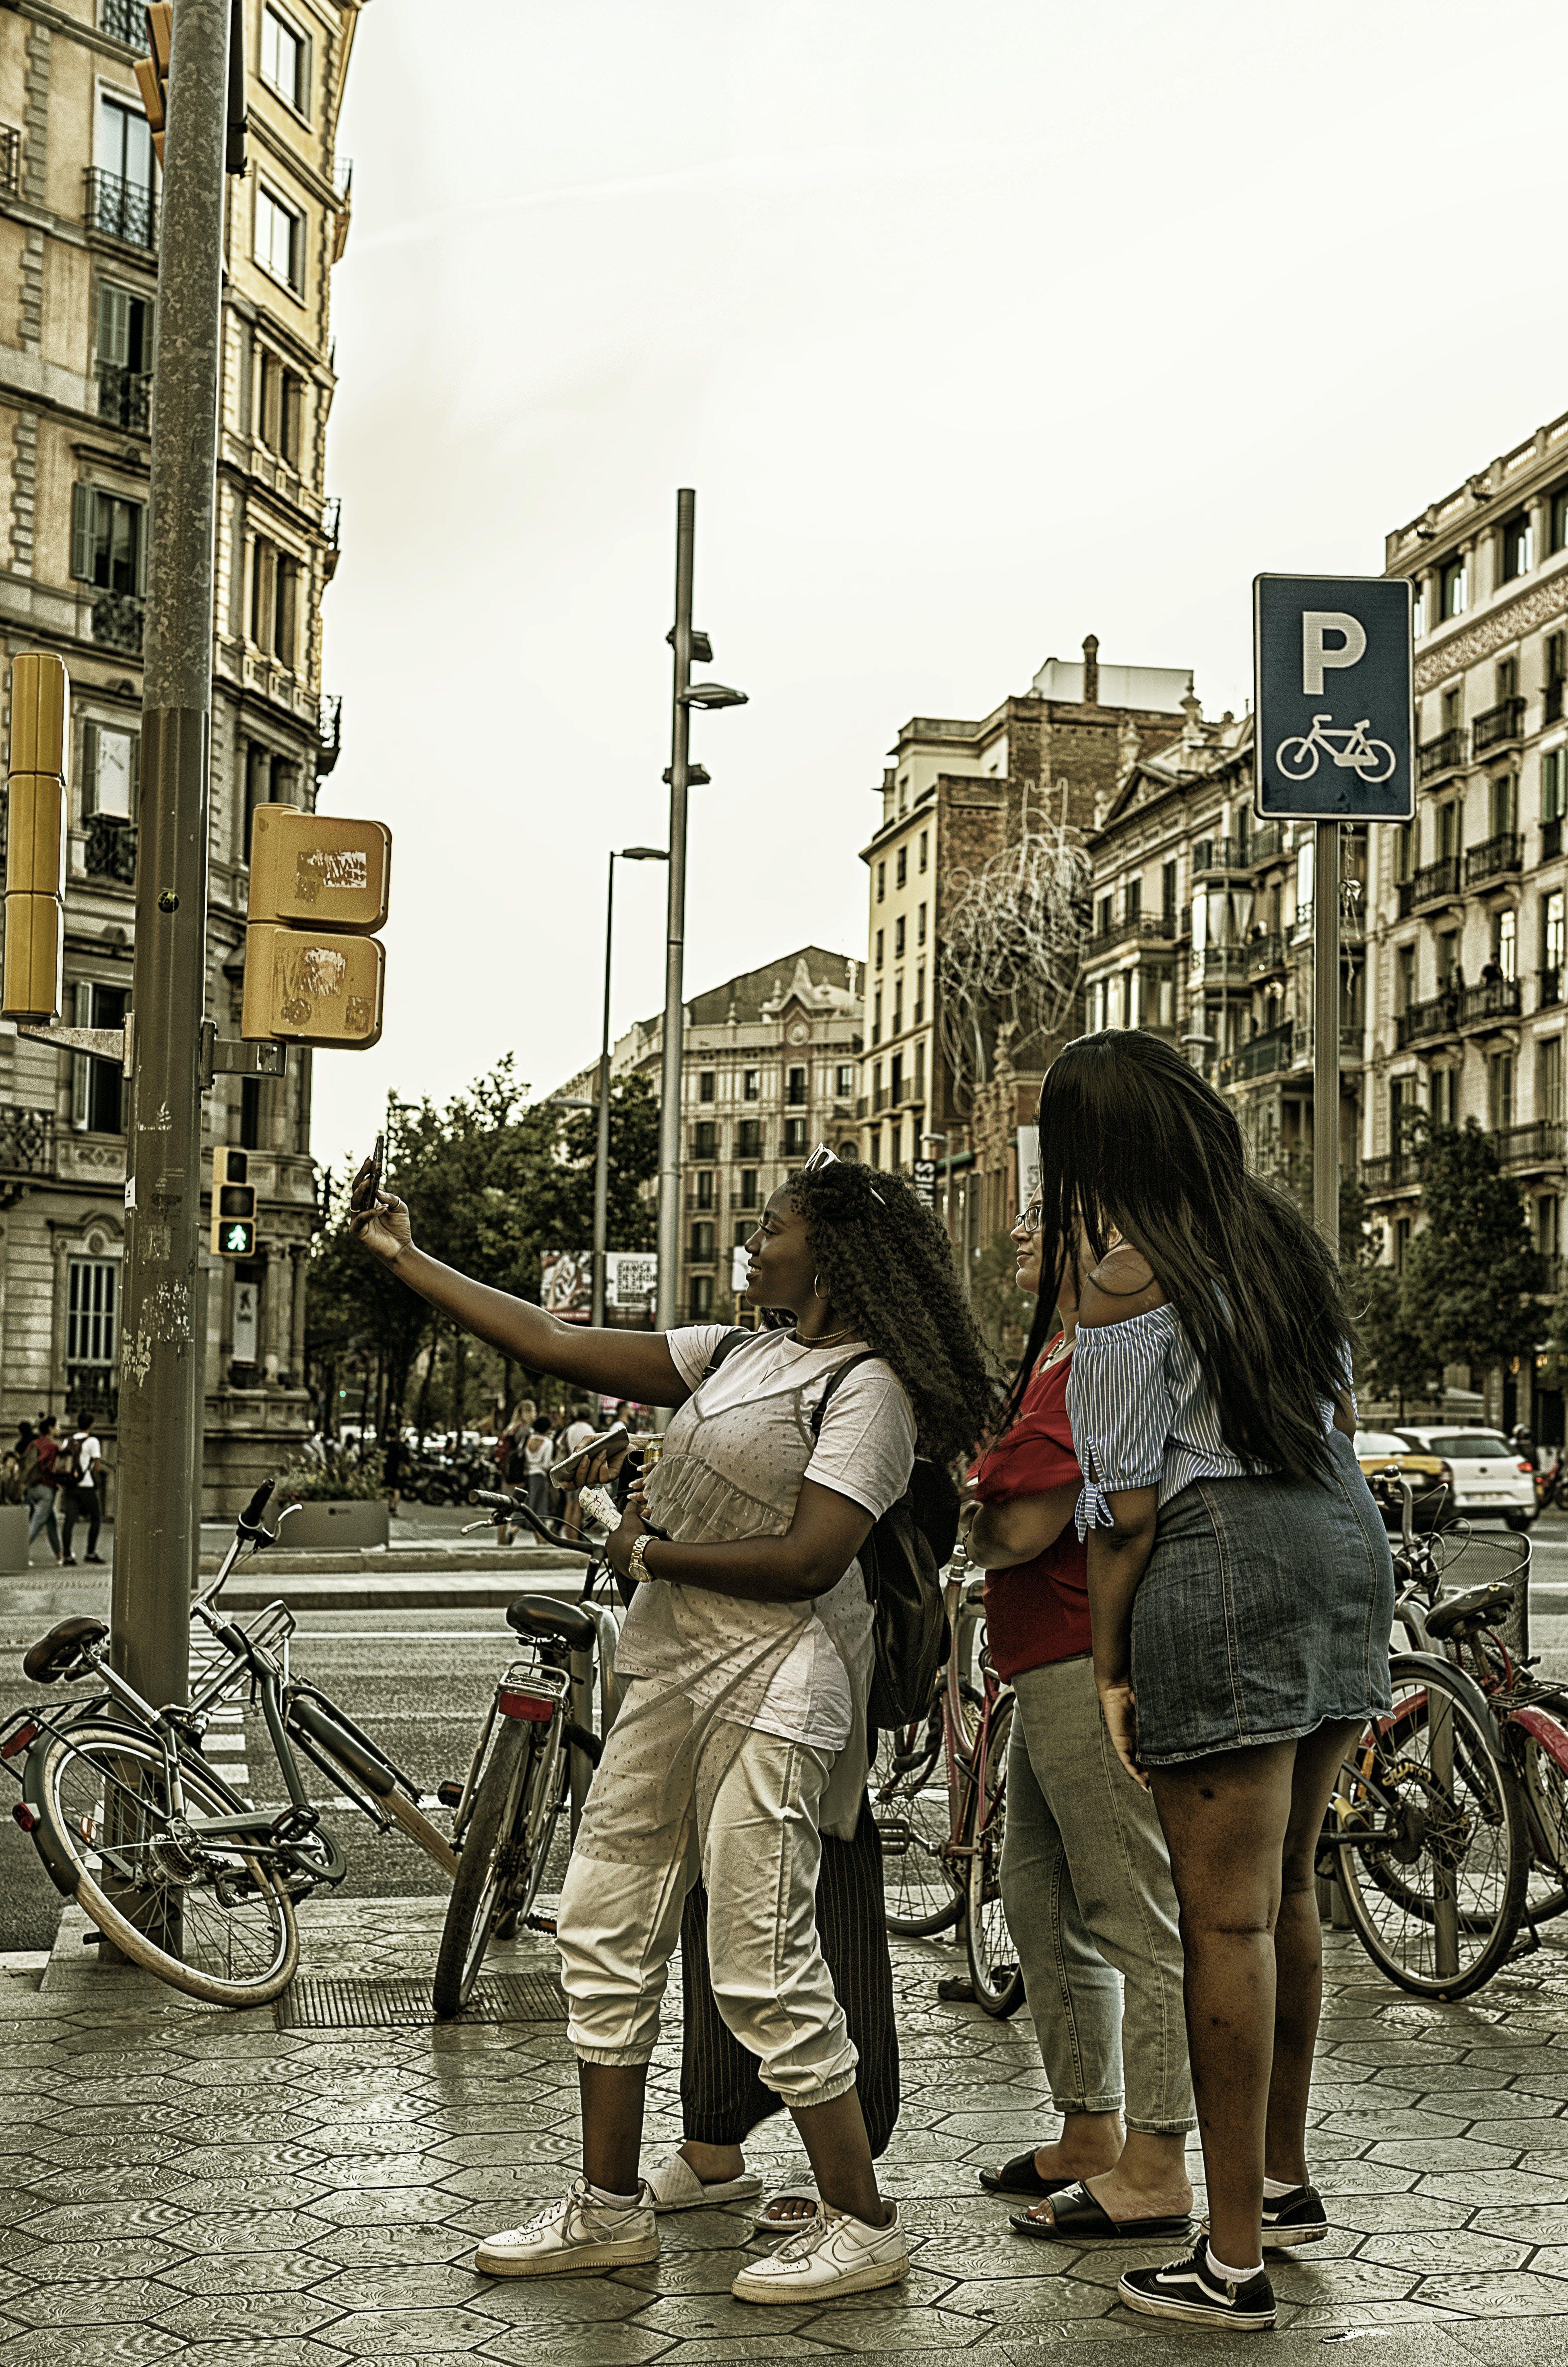 Free stock photo of Catalunya Square